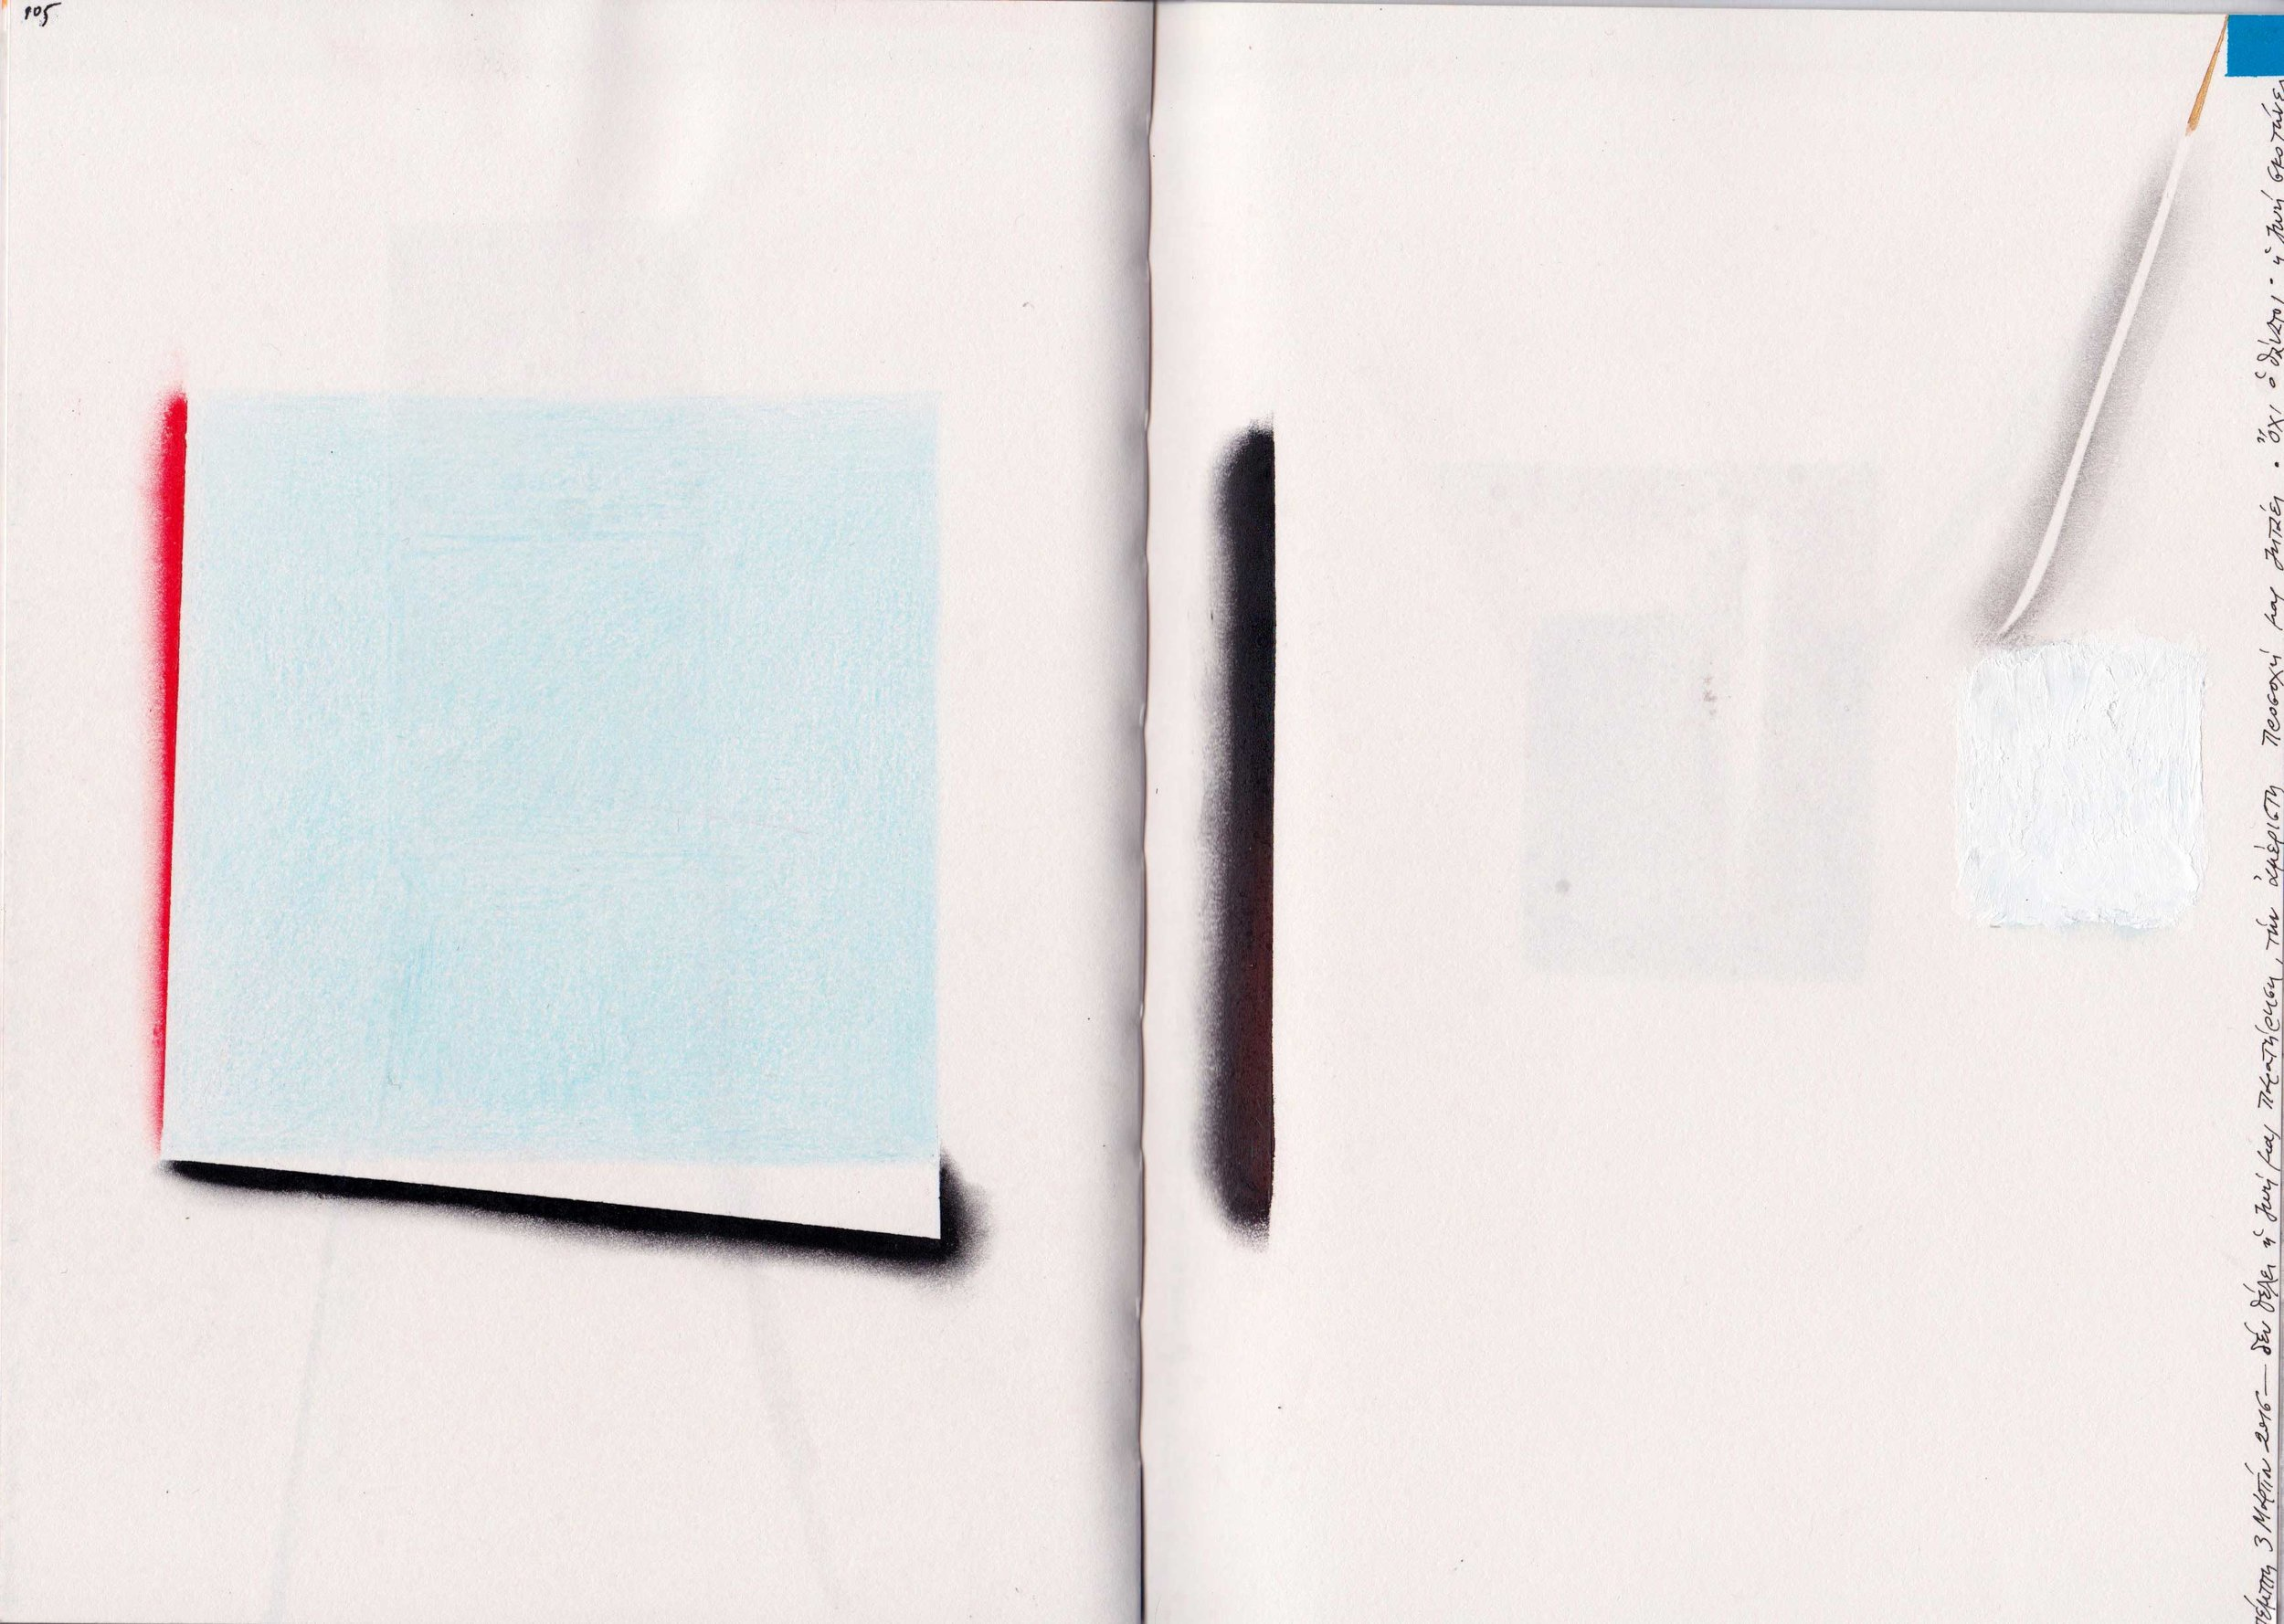 diary 18 page 105-106